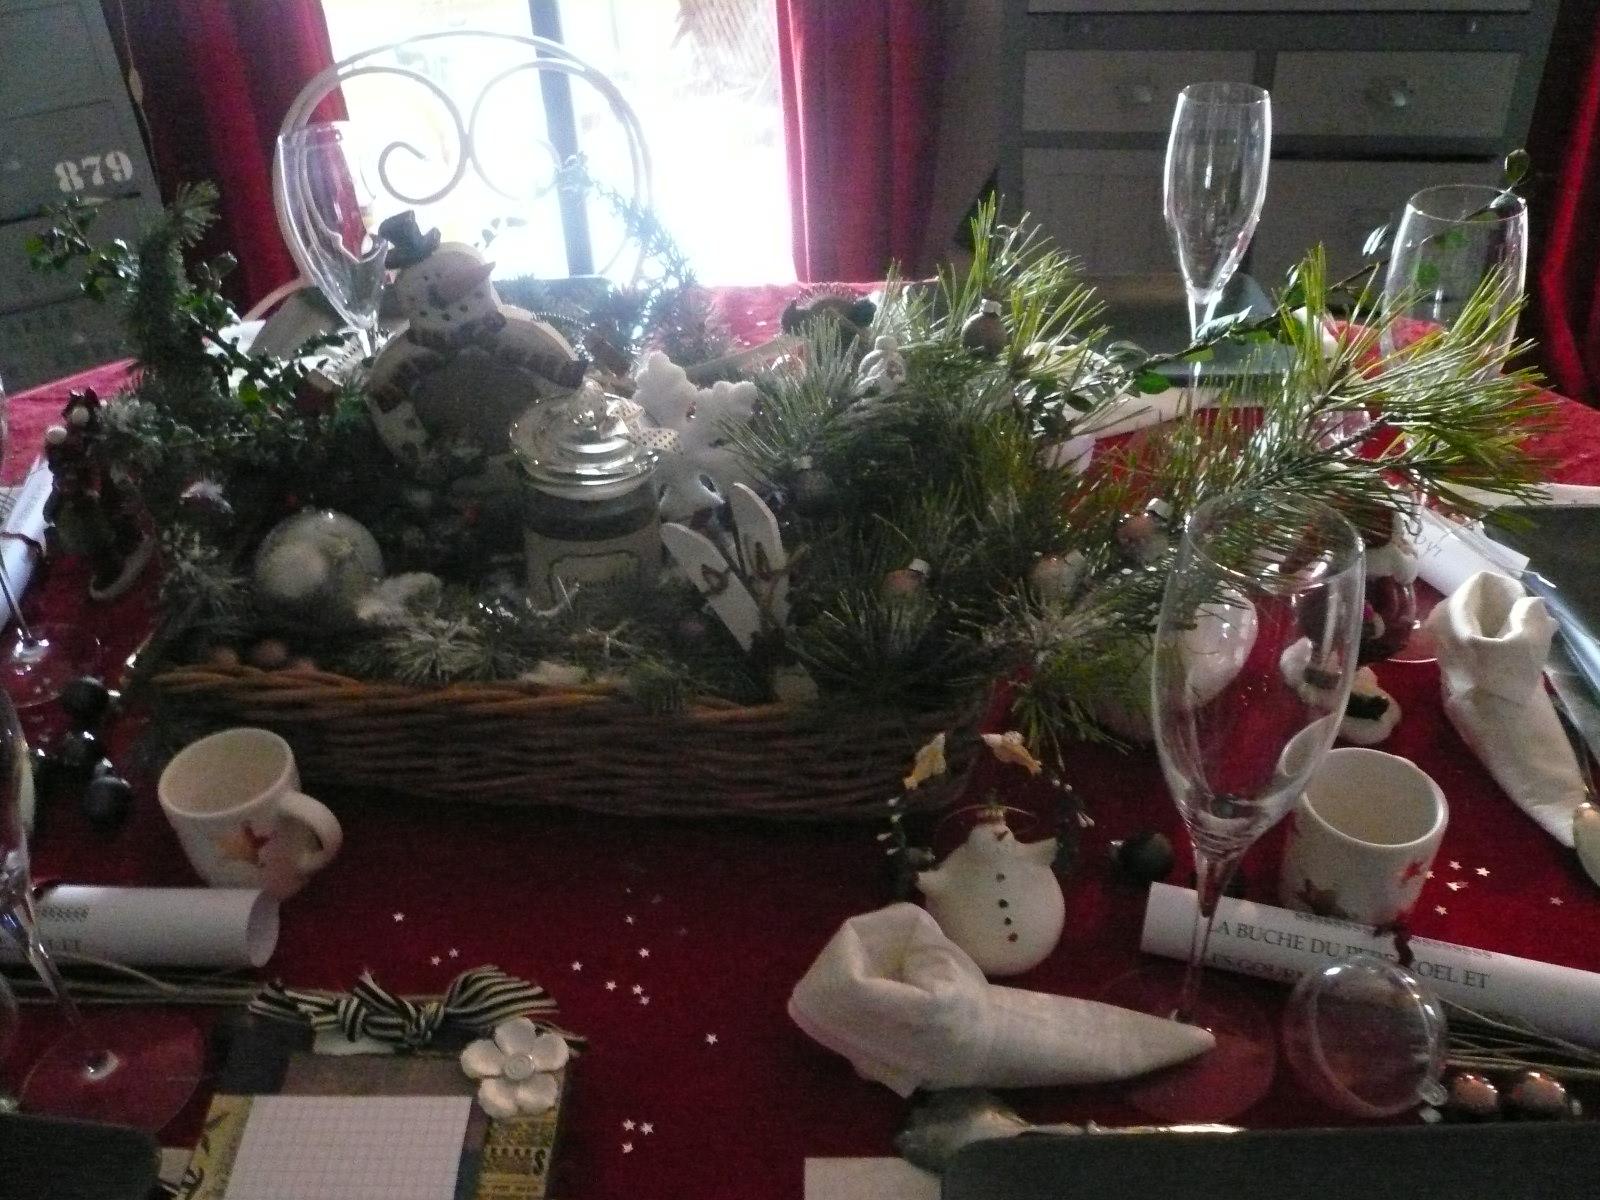 #62383A SCRAPRETTY: JOYEUX NOEL ( TUTORIEL D UN CENTRE DE TABLE) 5851 tutoriel decoration de table de noel 1600x1200 px @ aertt.com